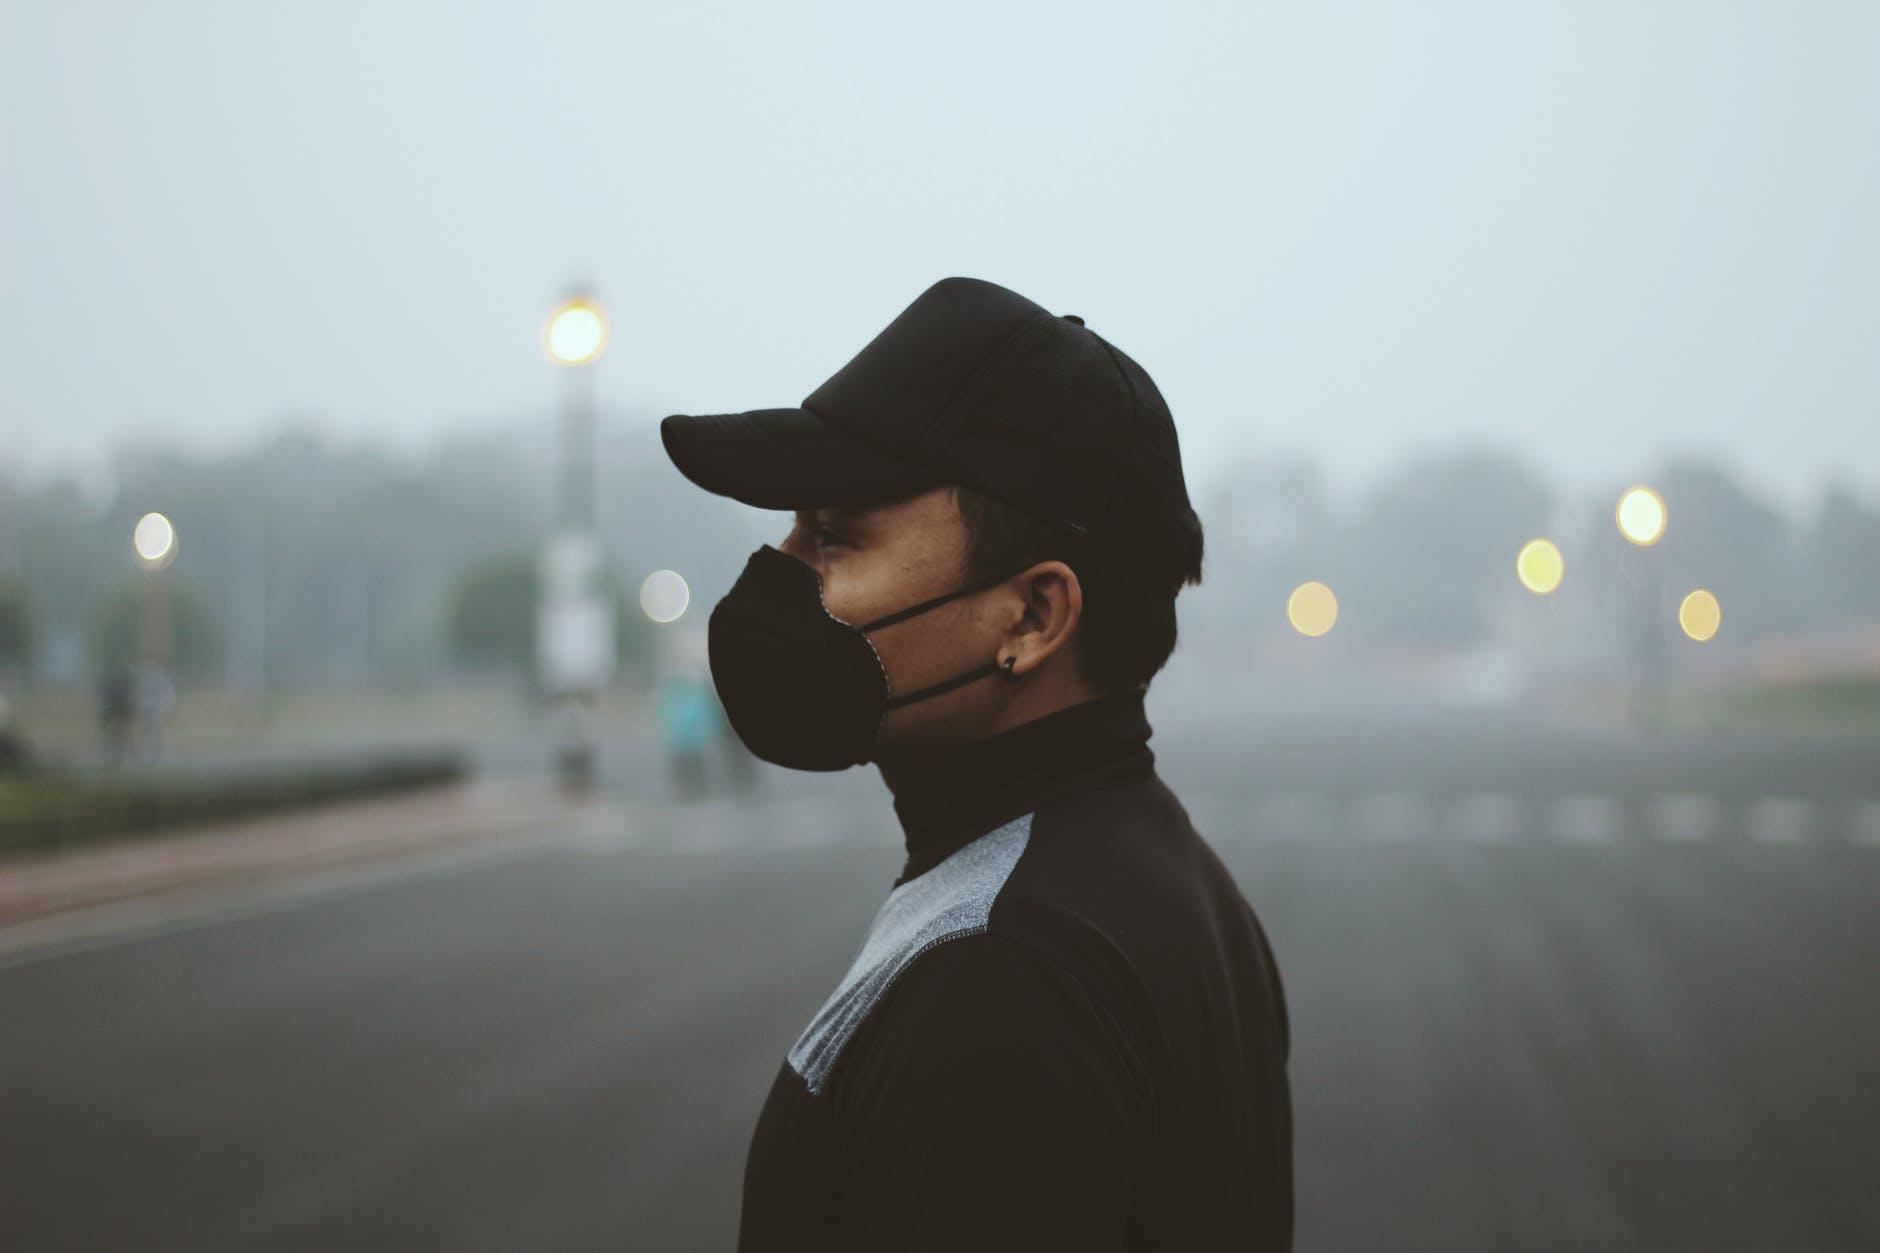 Understanding smog – Delhi's recurring winter problem